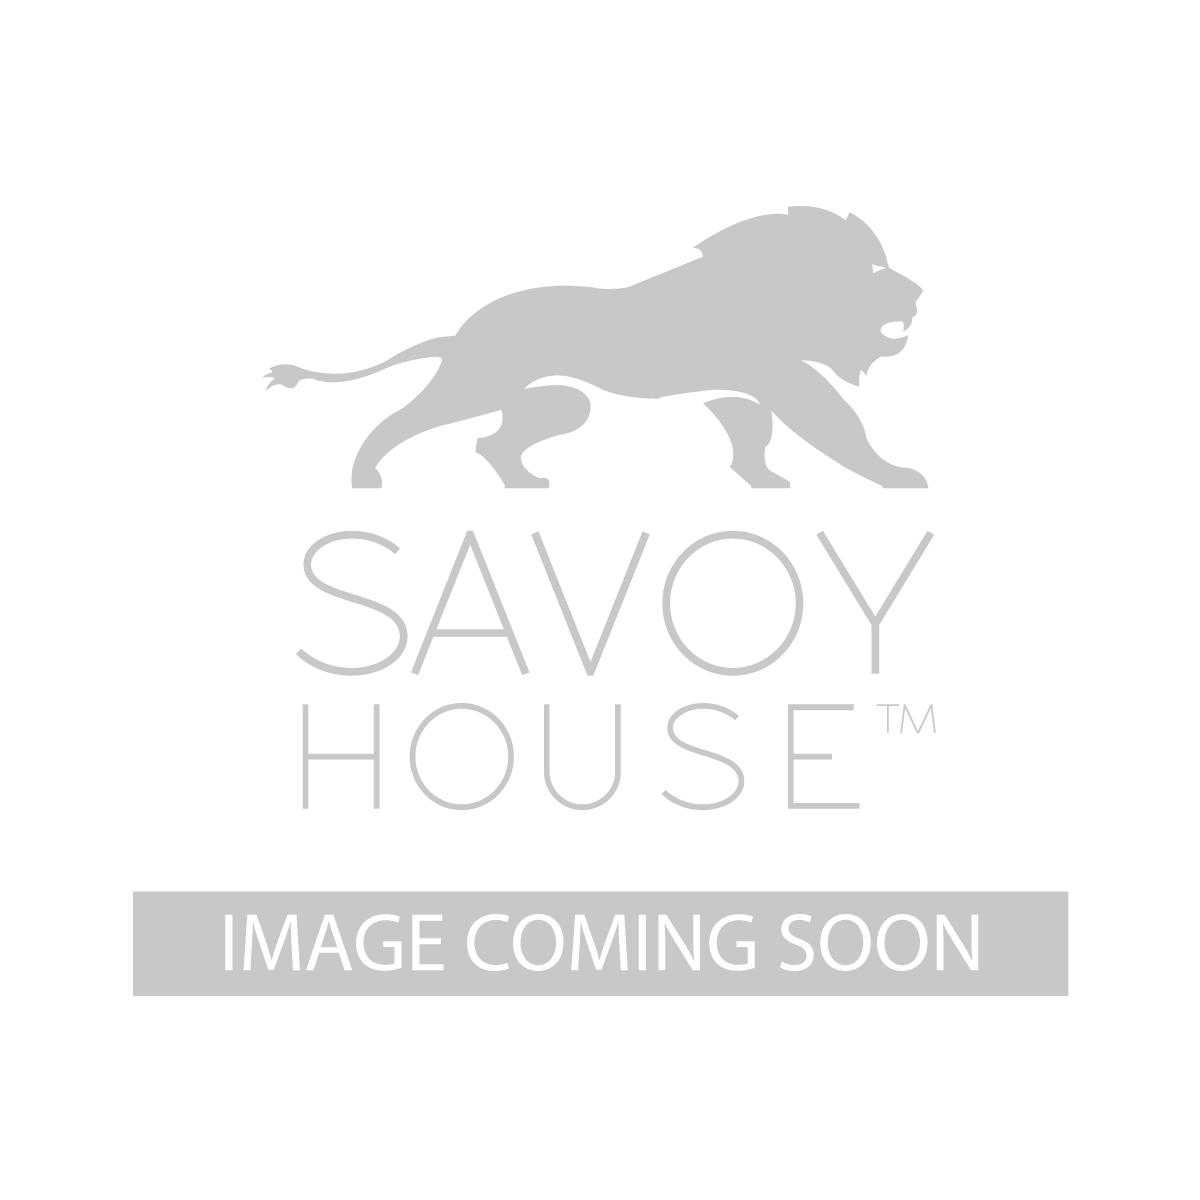 8 4030 4 13 octave 4 light bath bar by savoy house octave 4 light bath bar aloadofball Images